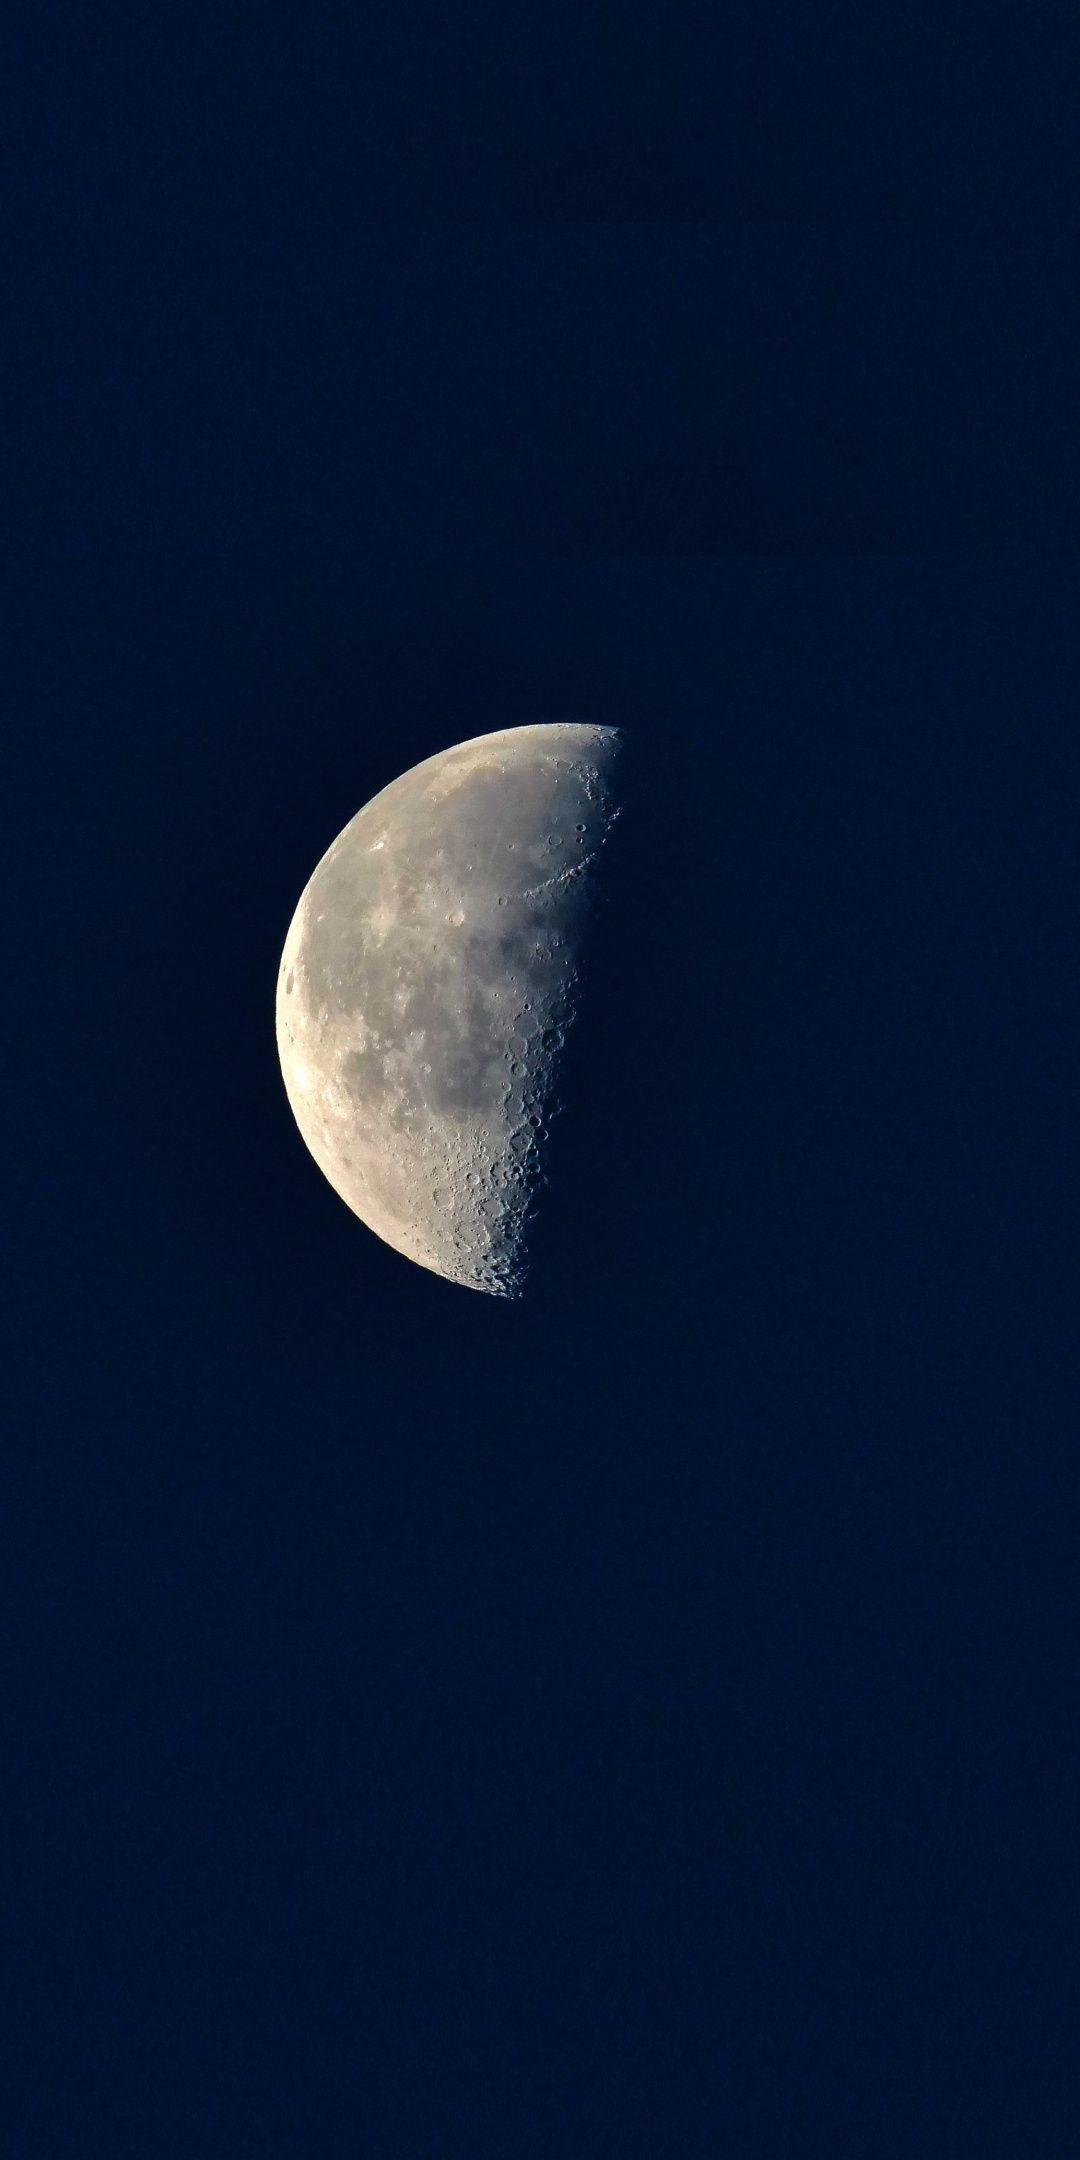 Moon, half, blue sky, night, 1080x2160 wallpaper Blue